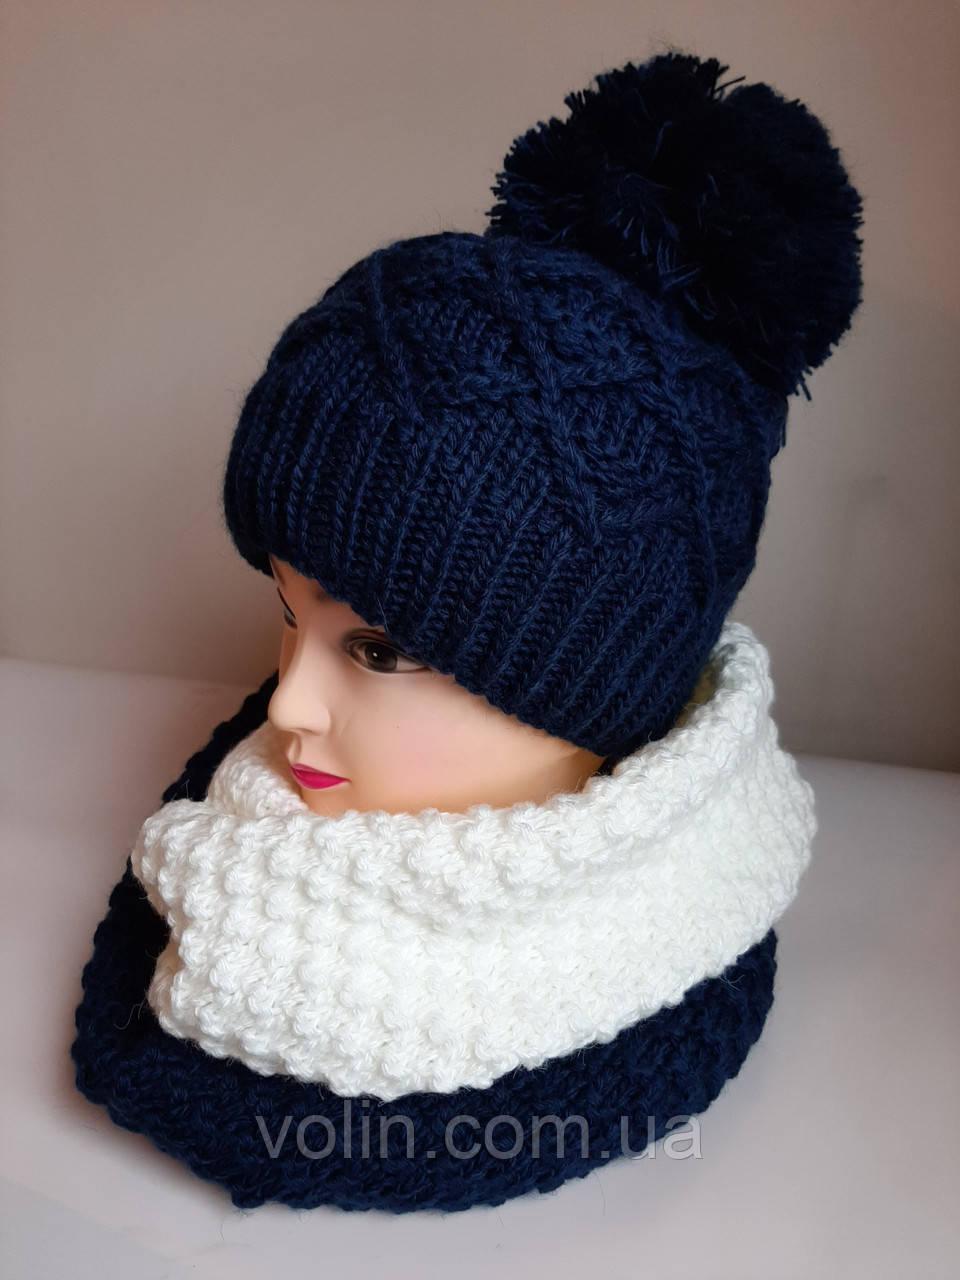 Зимние женские комплекты шапка и снуд, Ирма.